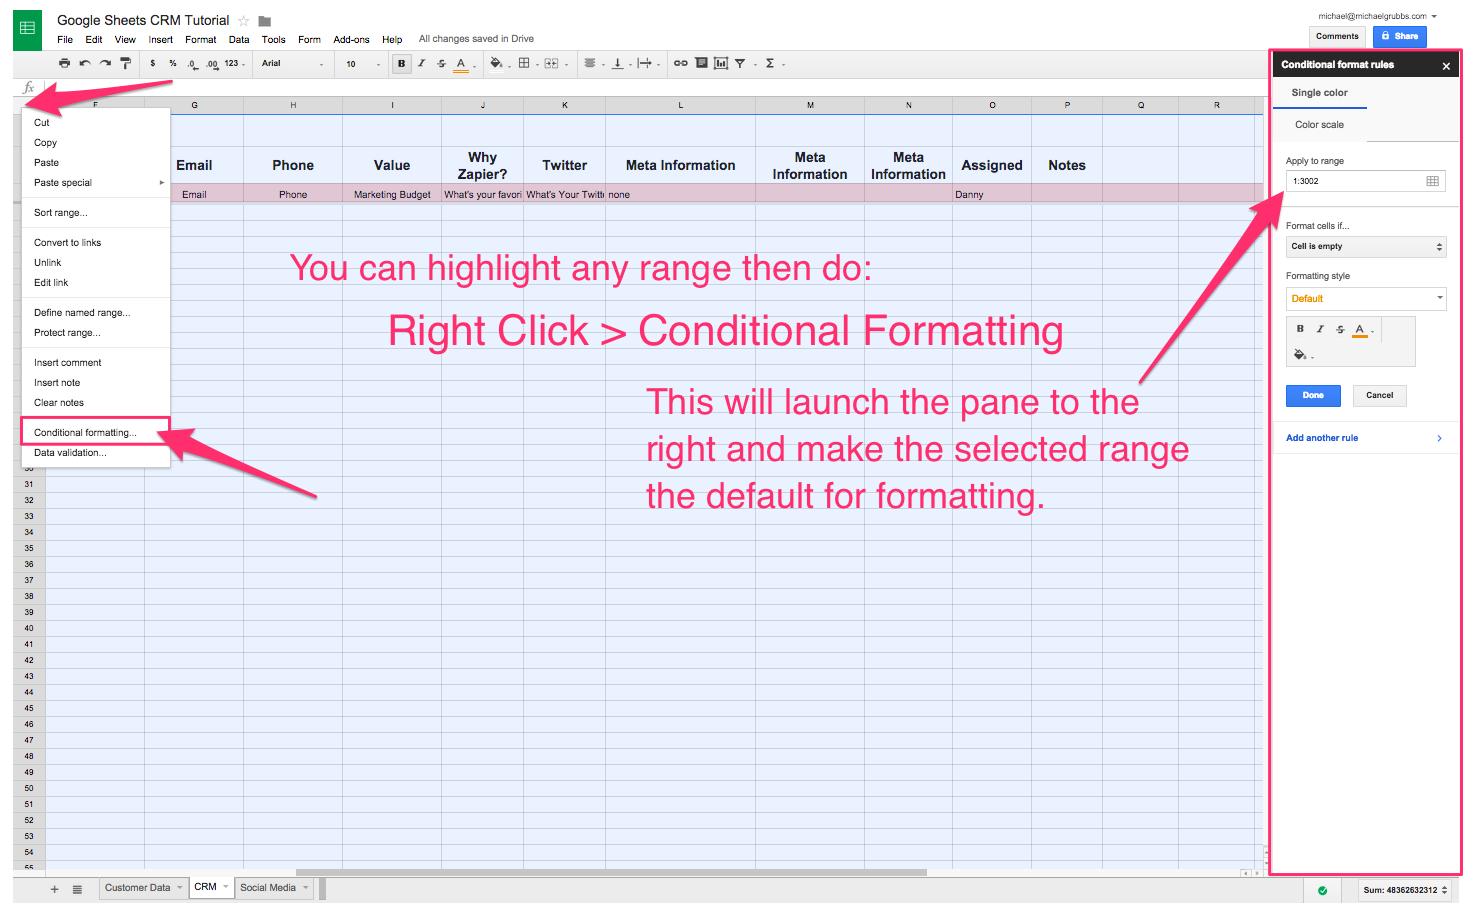 Spreadsheet Crm: How To Create A Customizable Crm With Google Sheets With How To Create A Sales Tracking Spreadsheet